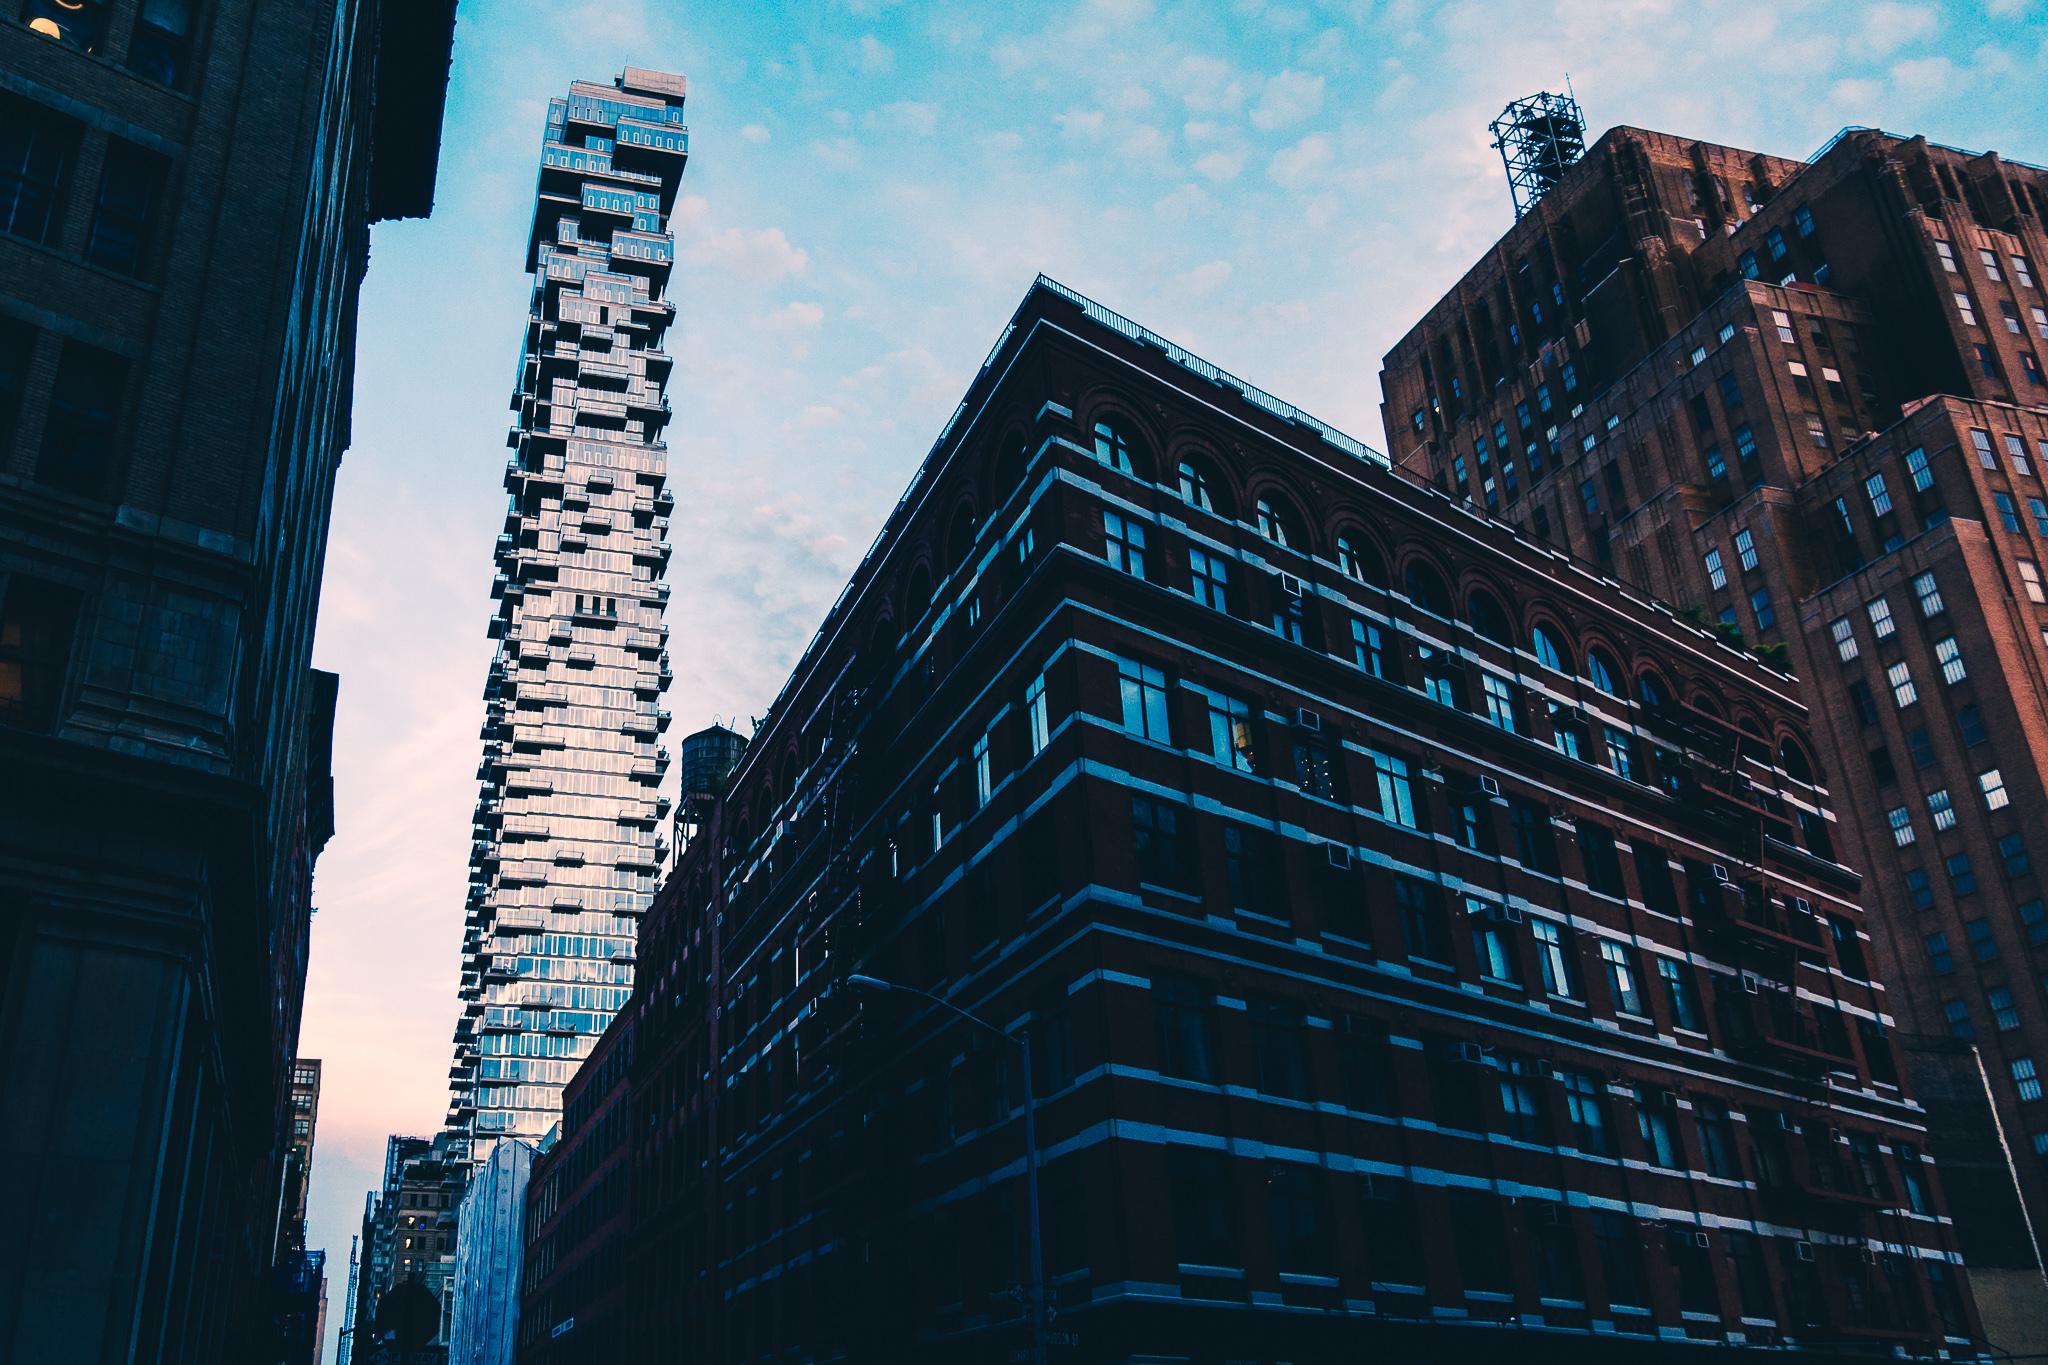 New York City Sony RX100V